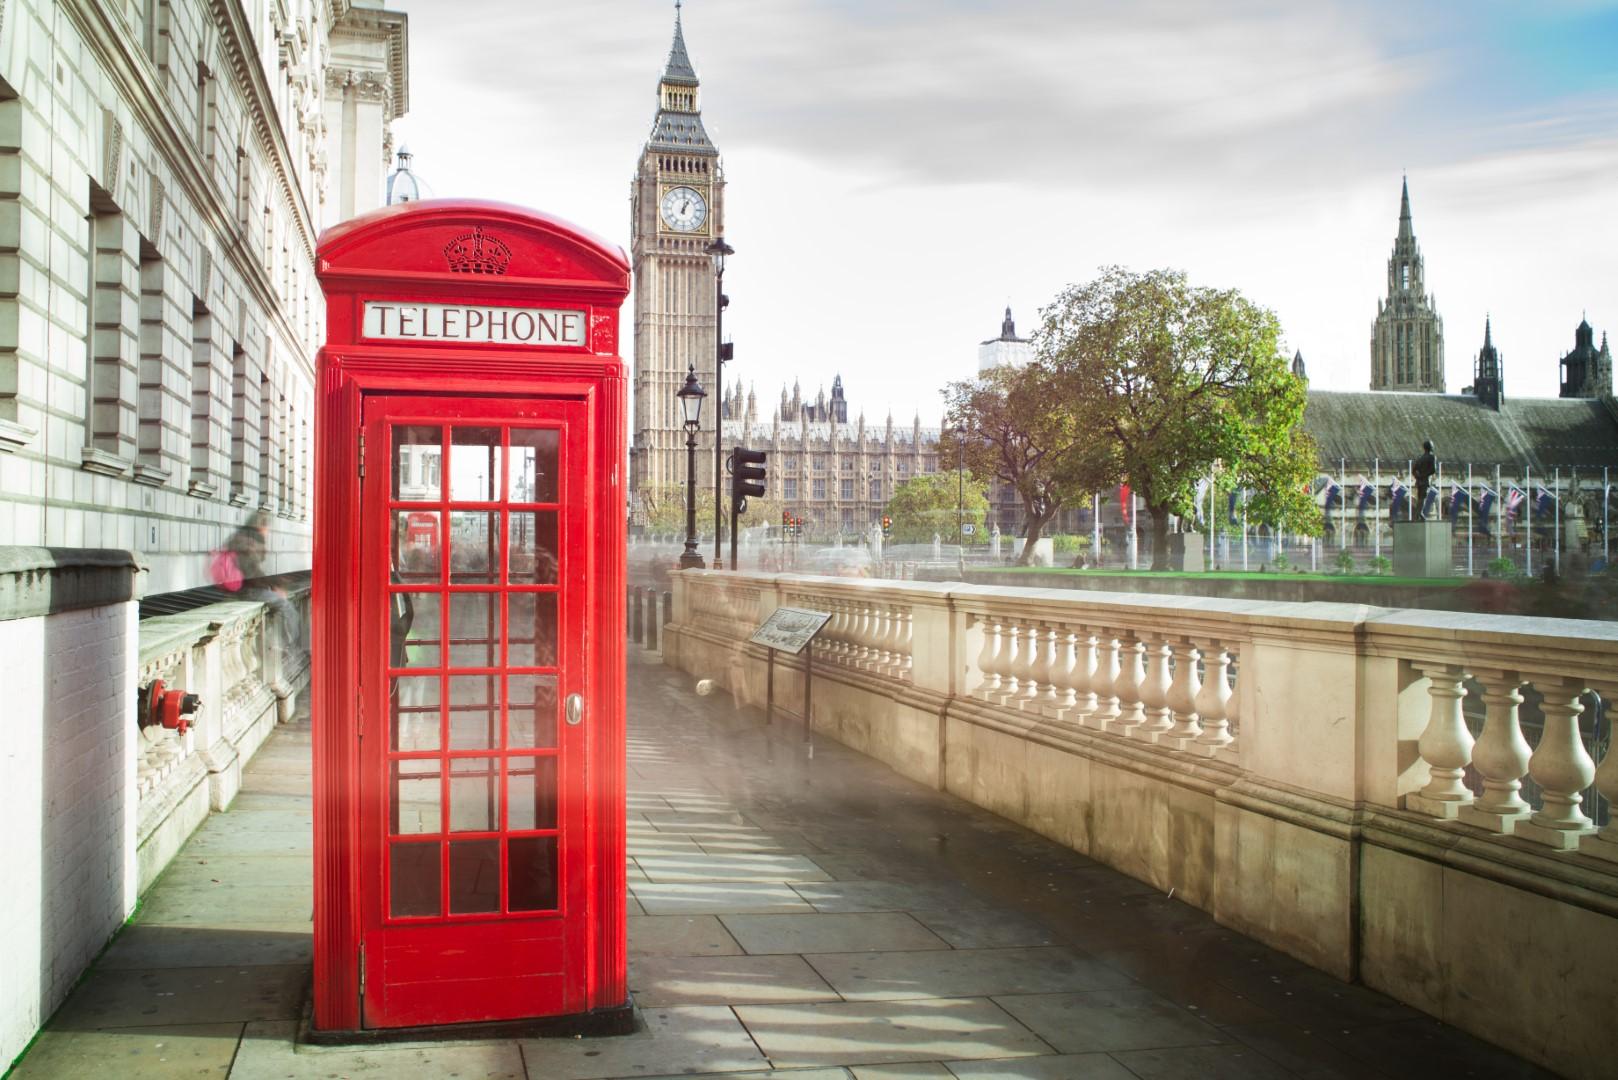 accueil-telephonique-anglais